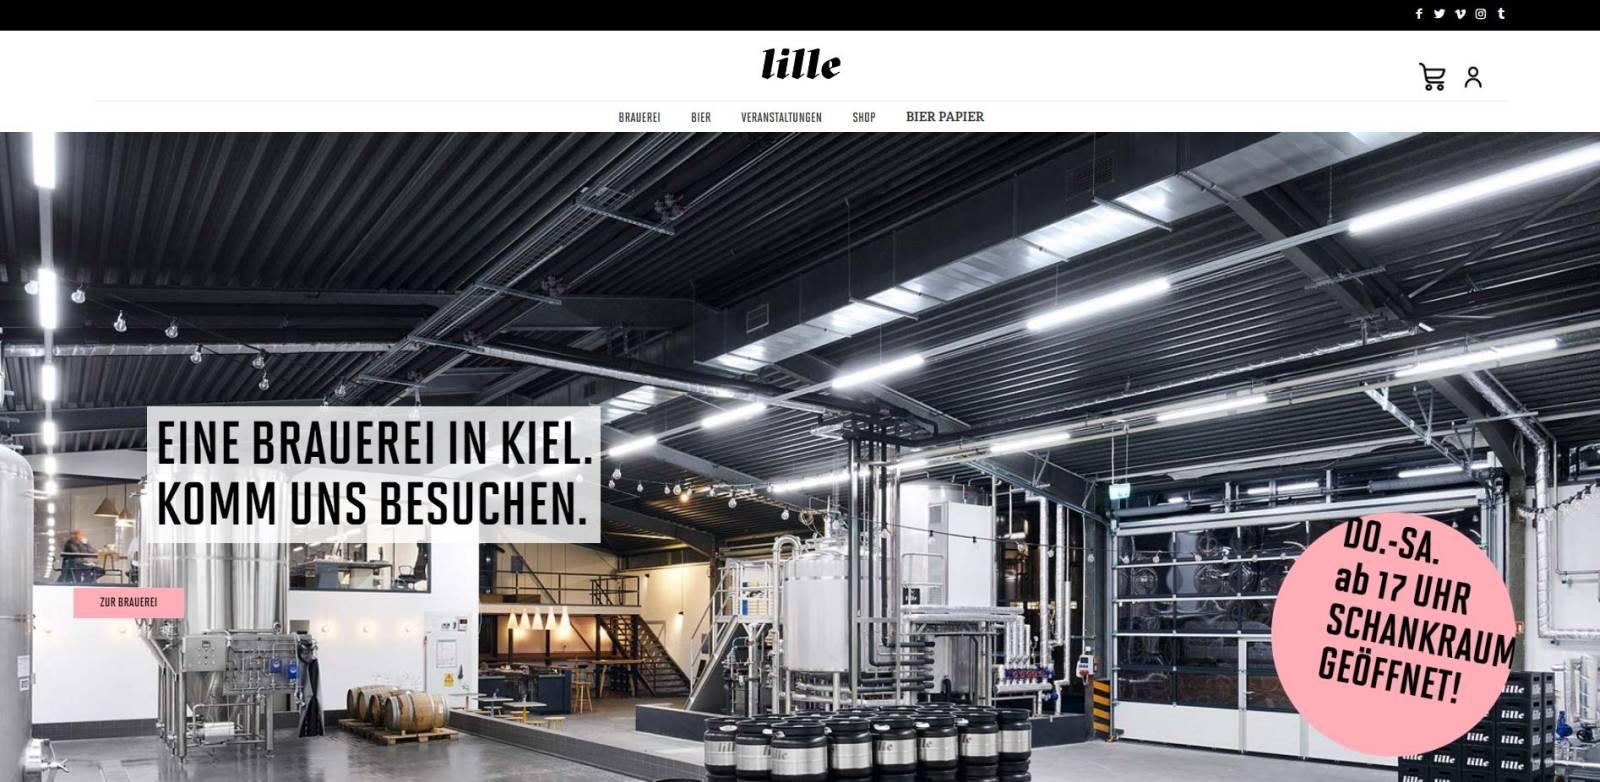 lille Brauerei Kiel Homepage